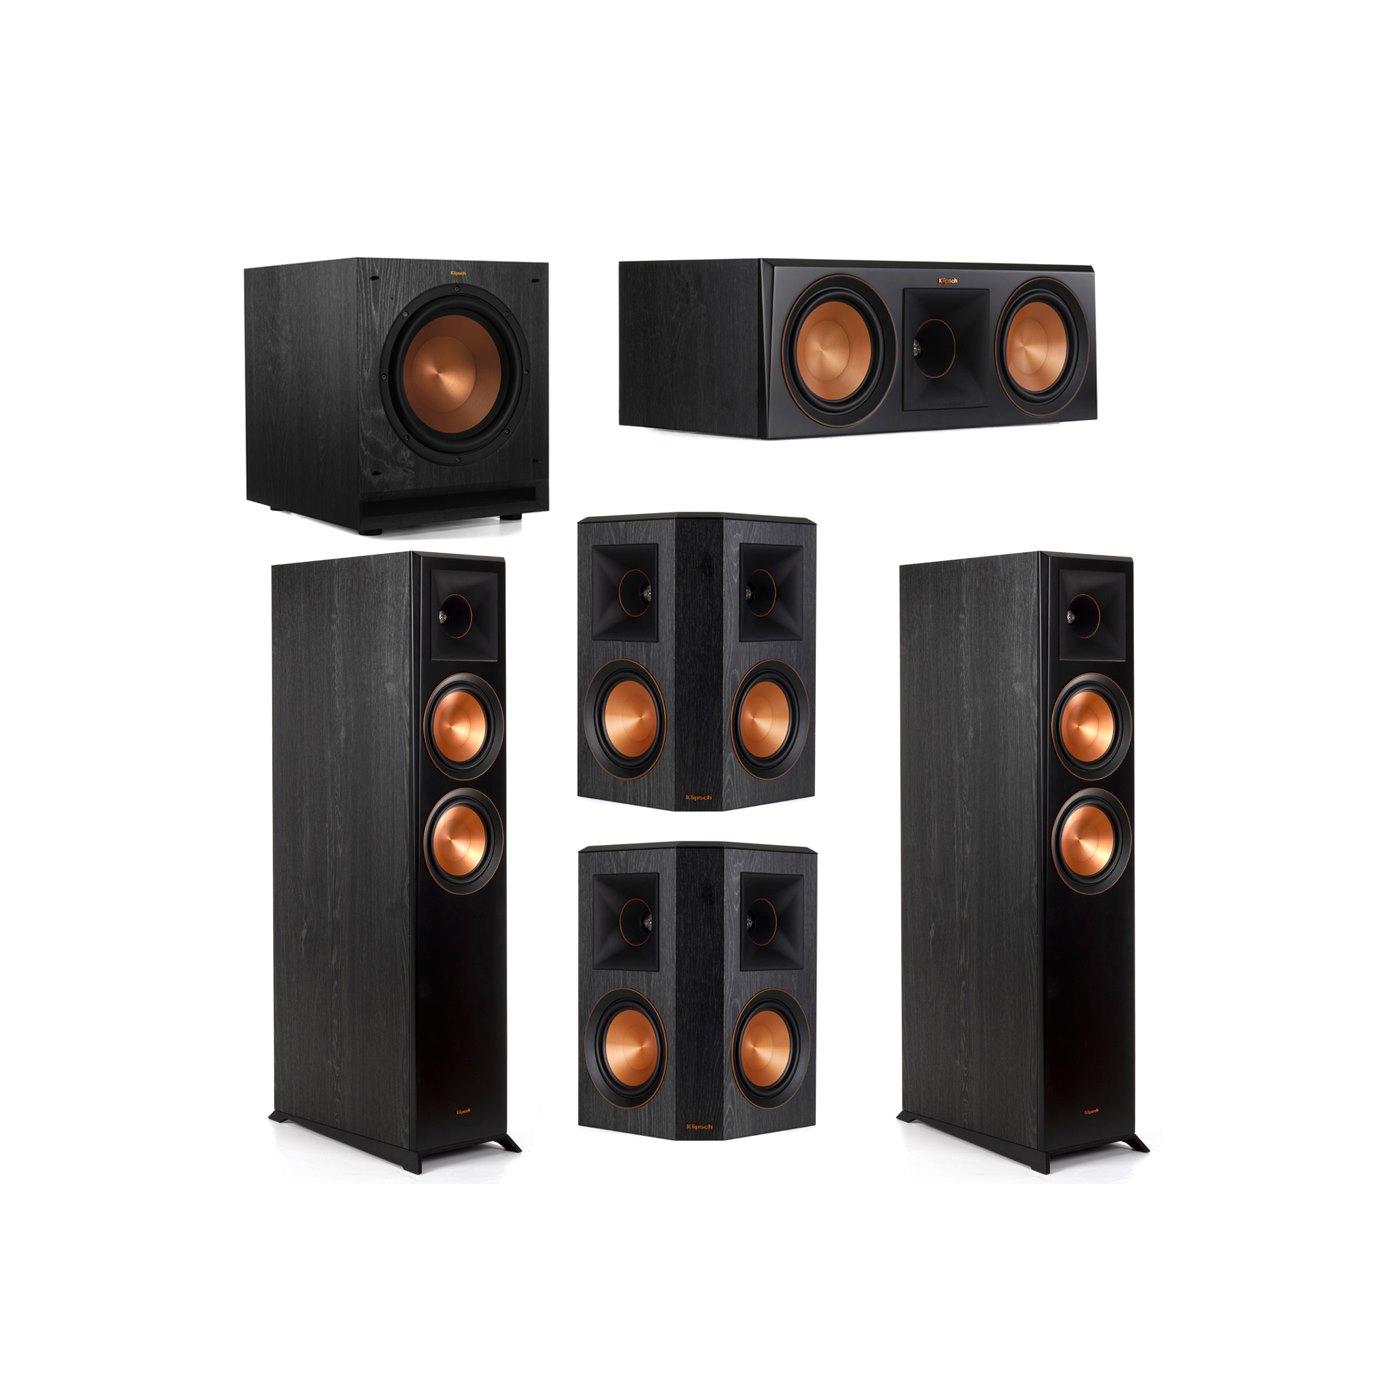 Klipsch 5.1 System with 2 RP-6000F Floorstanding Speakers, 1 Klipsch RP-600C Center Speaker, 2 Klipsch RP-502S Surround Speakers, 1 Klipsch SPL-100 Subwoofer